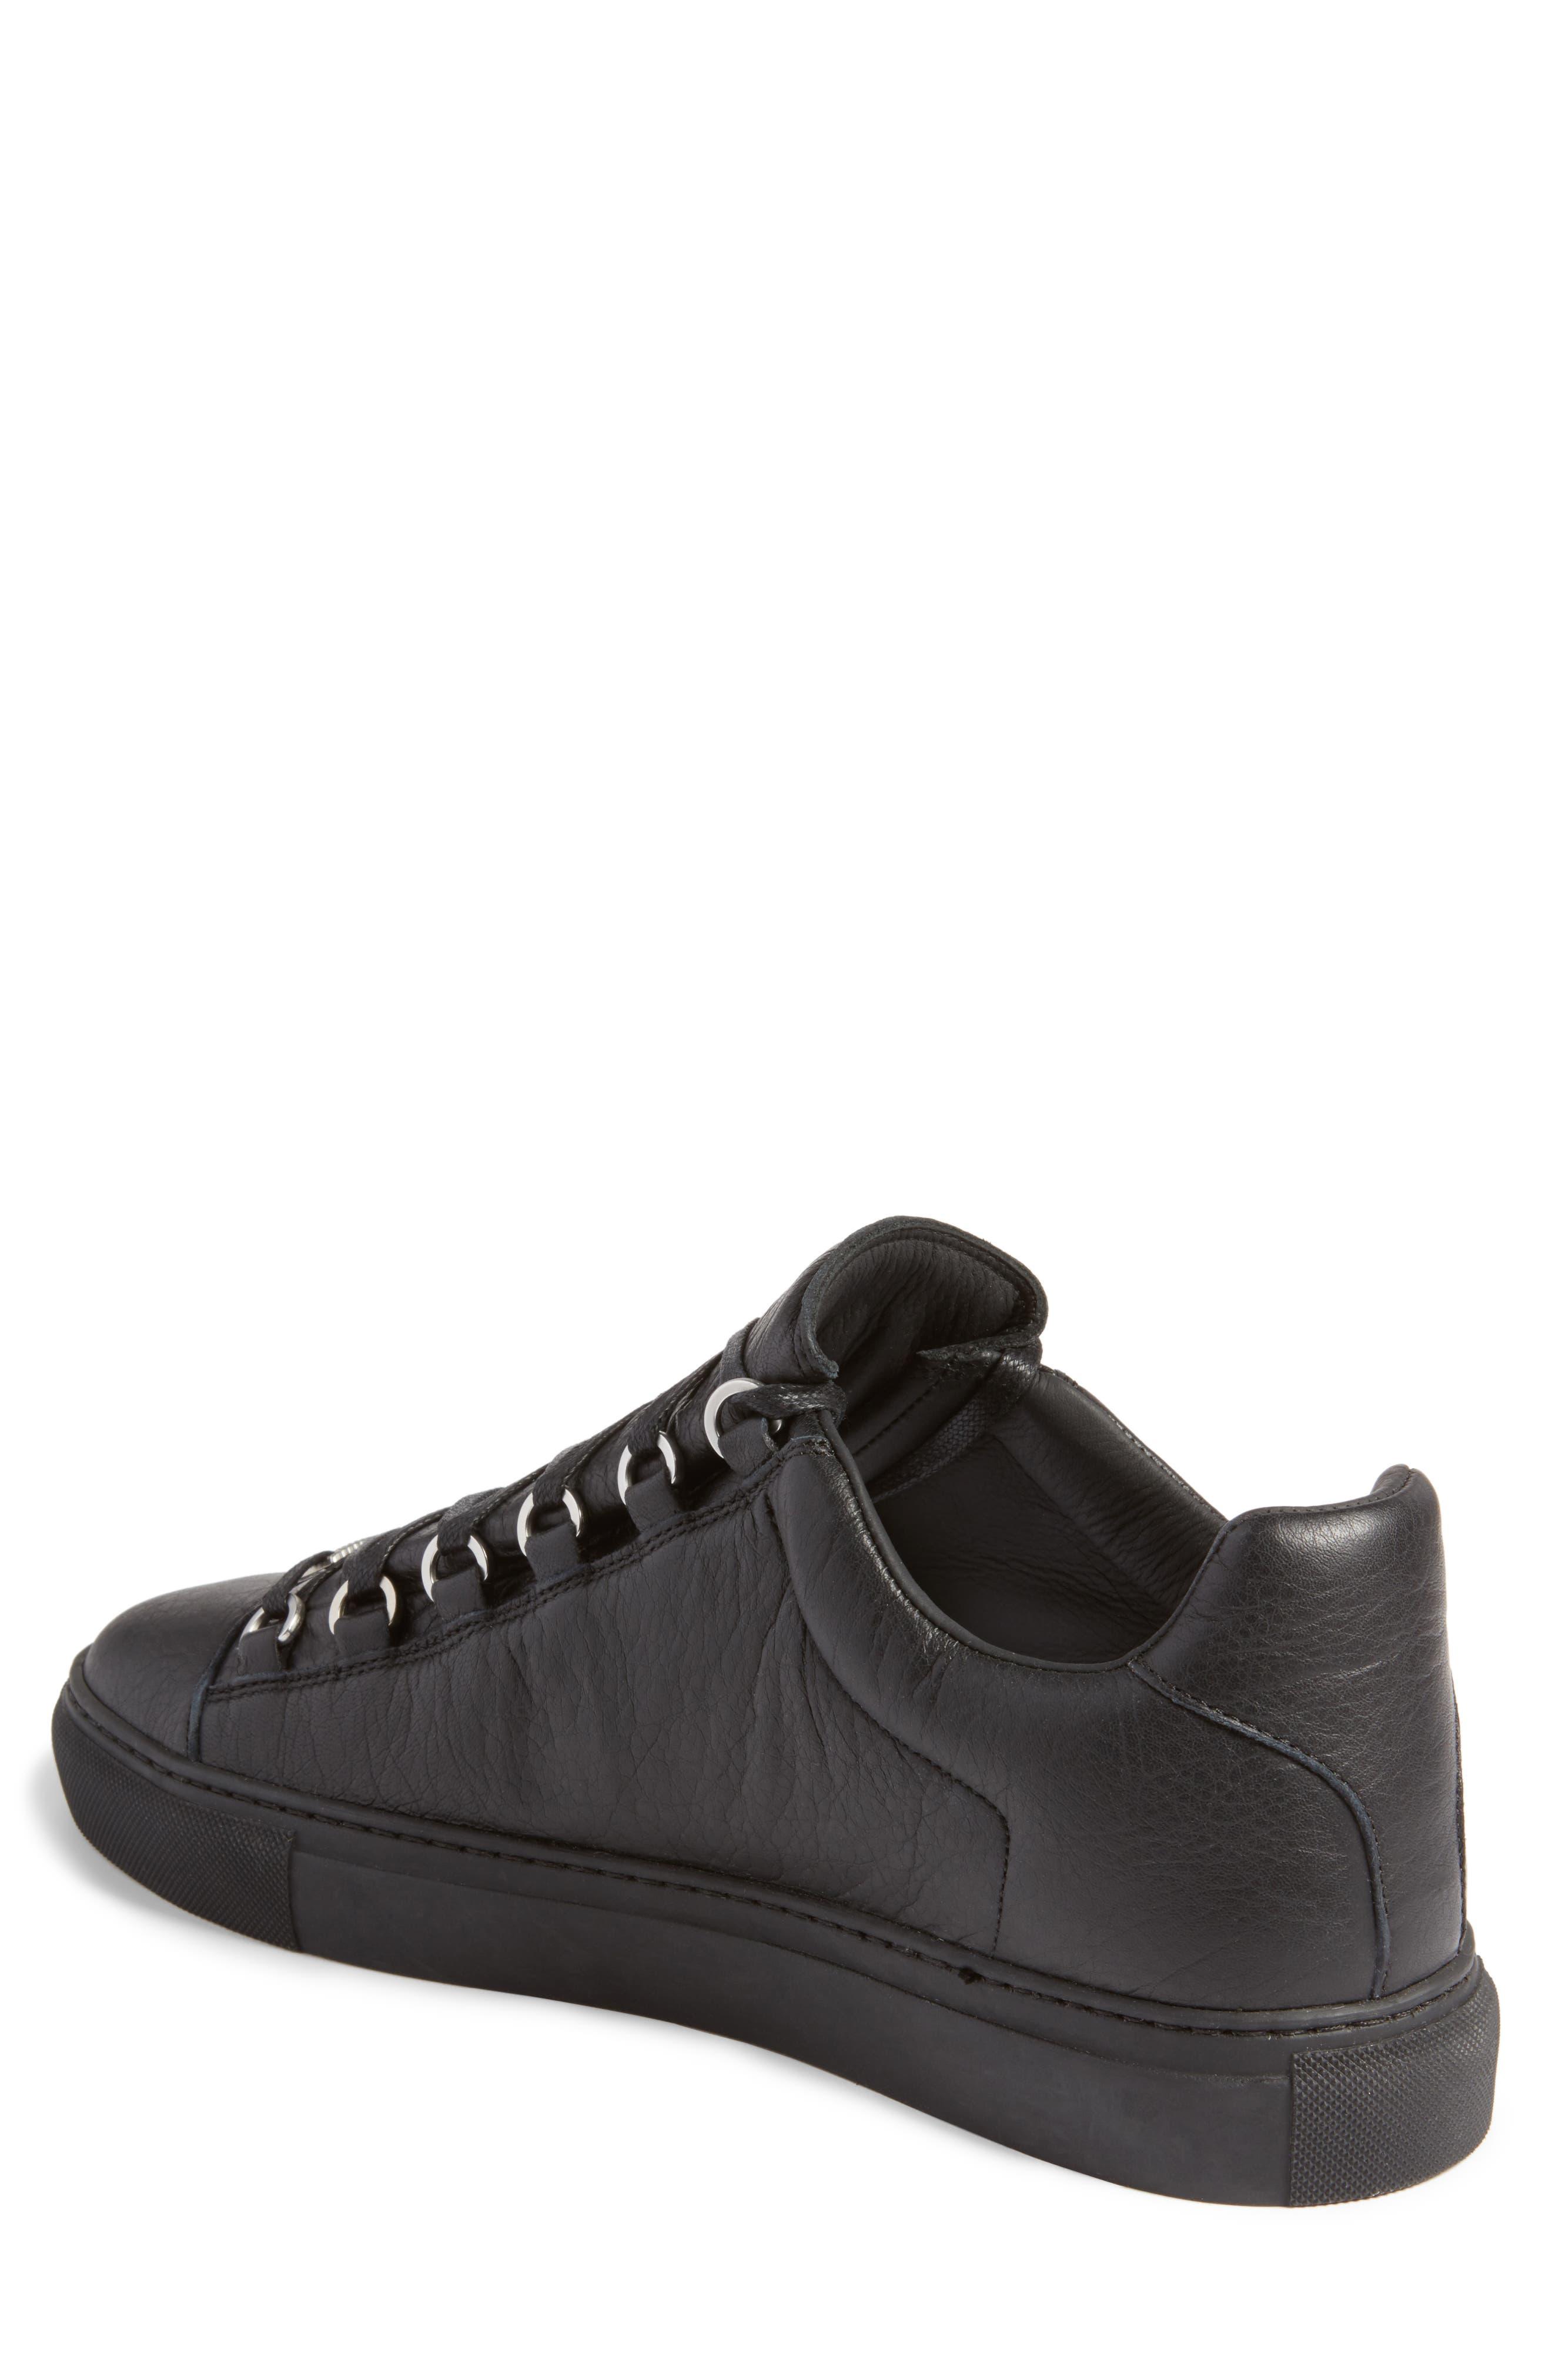 Alternate Image 2  - Balenciaga Arena Low Sneaker (Men)